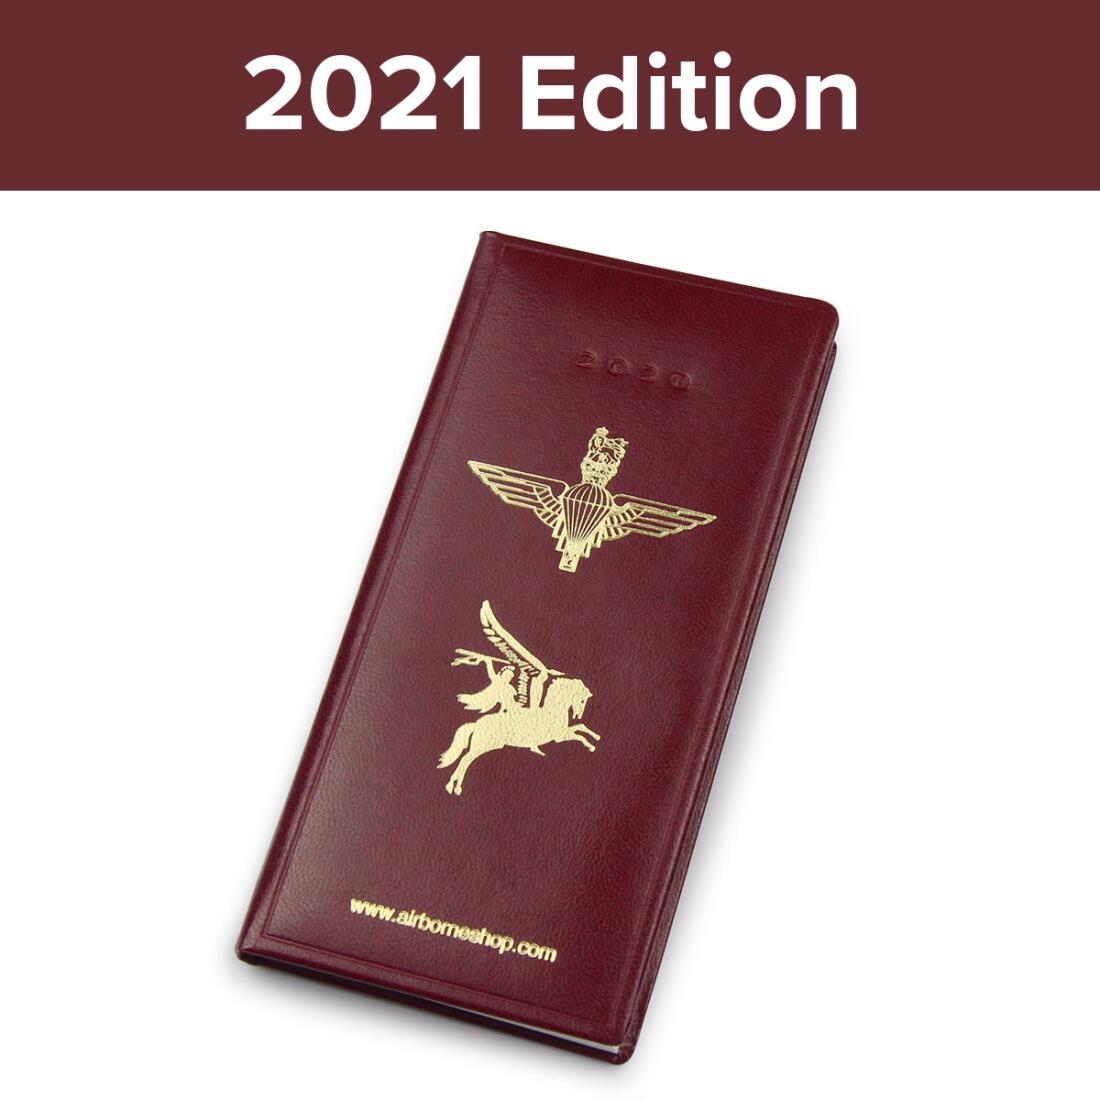 2021 Para & Pegasus Pocket Diary